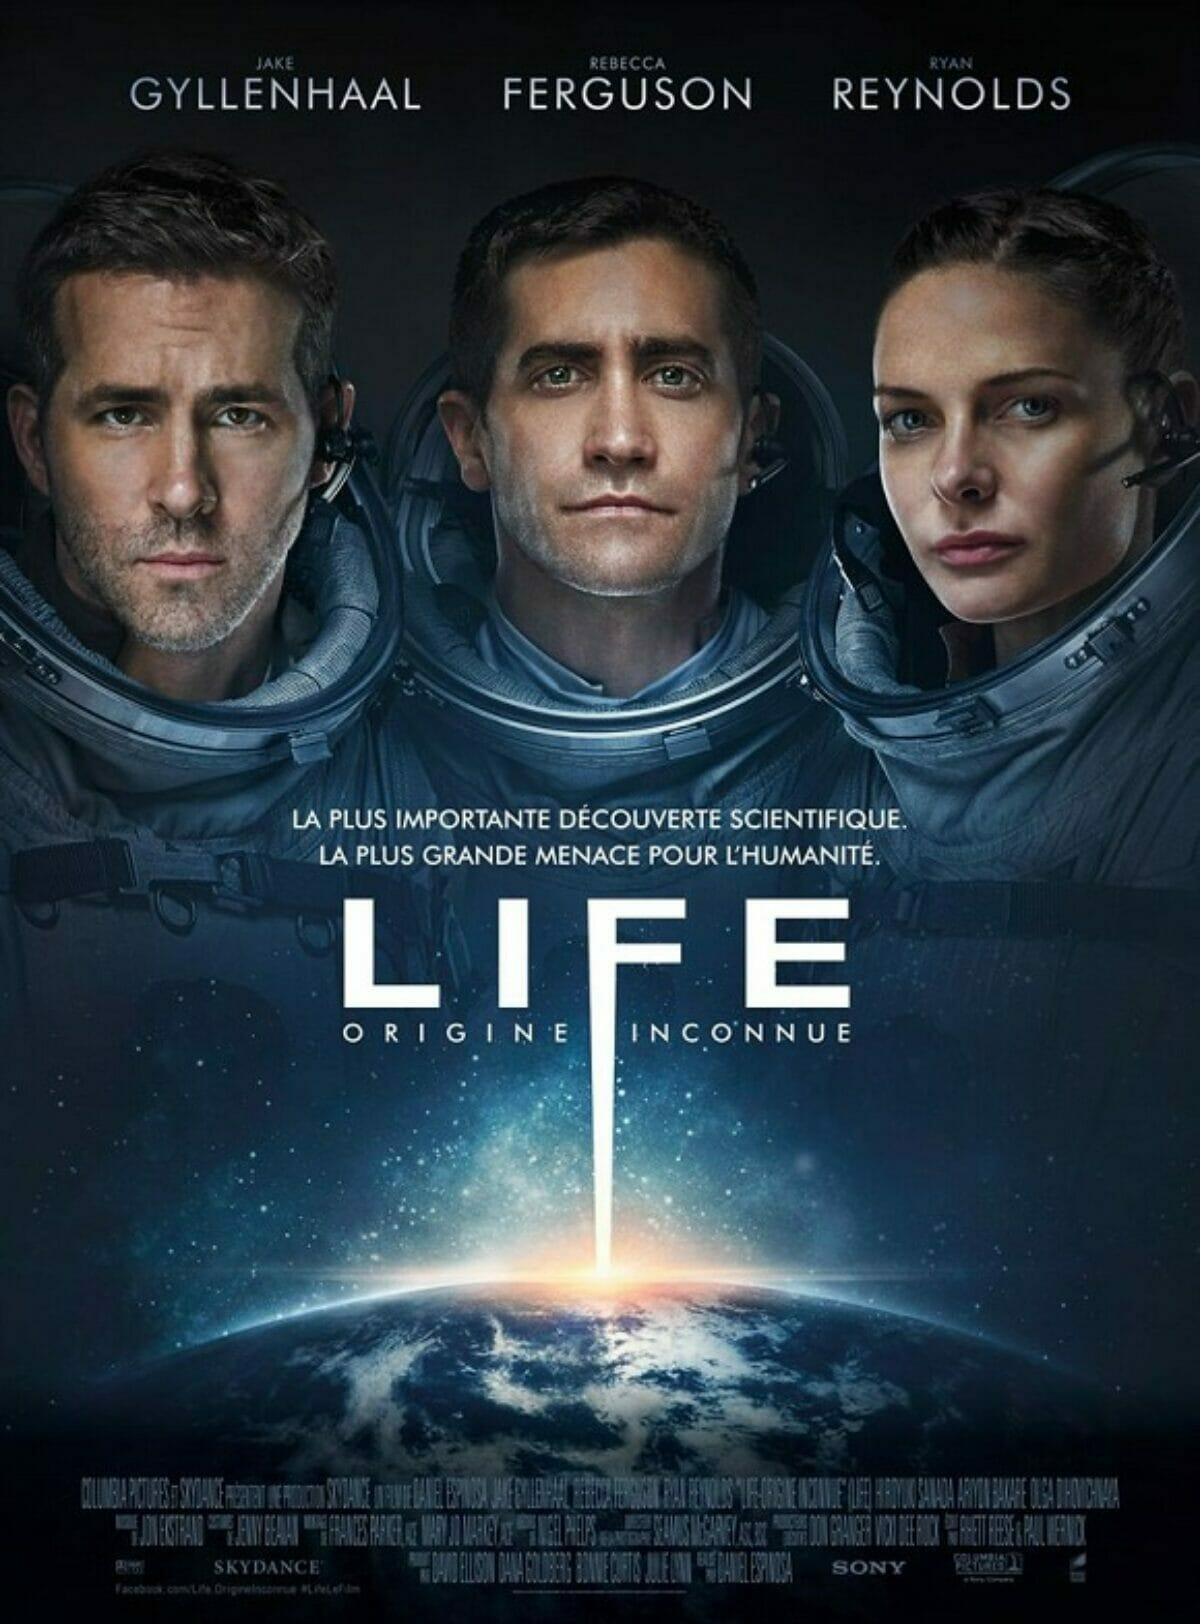 Life-origine-inconnue-poster